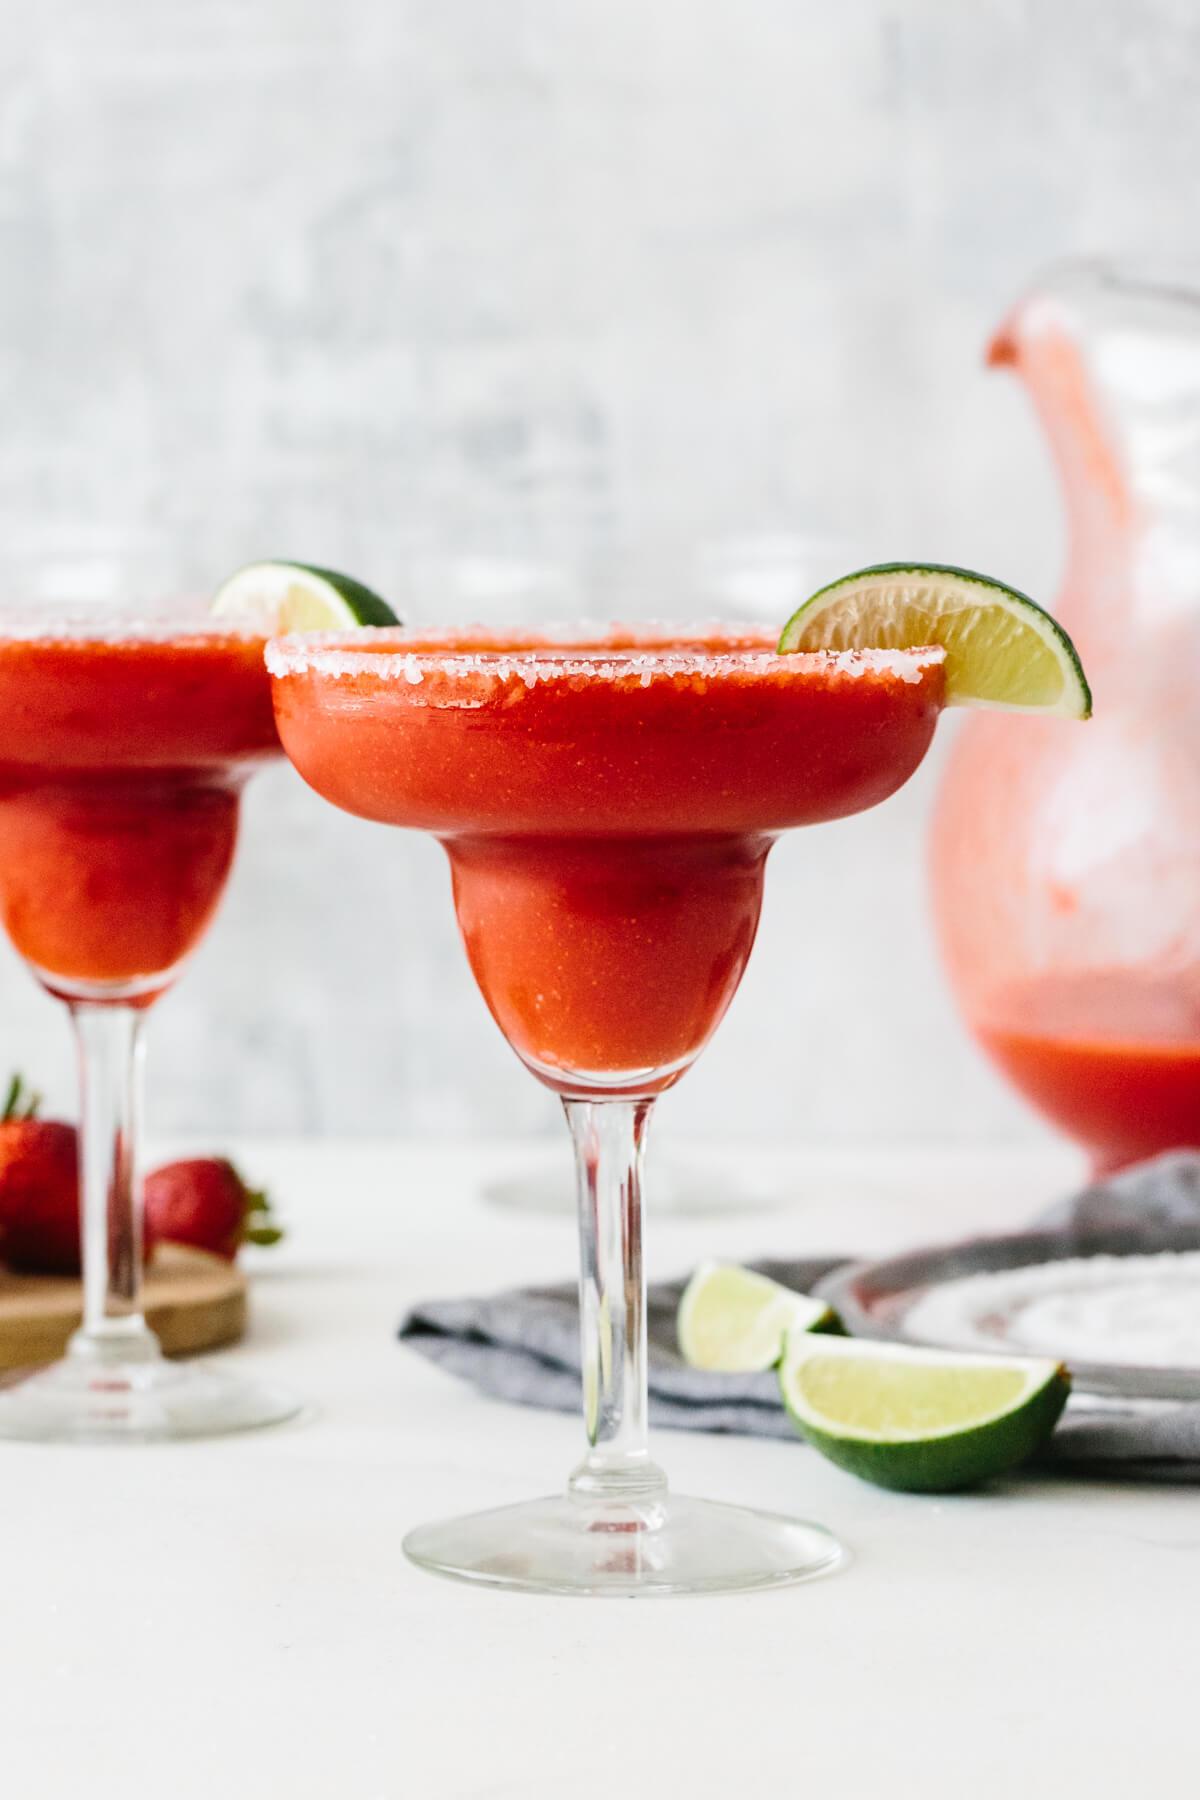 Strawberry margarita in a glass.